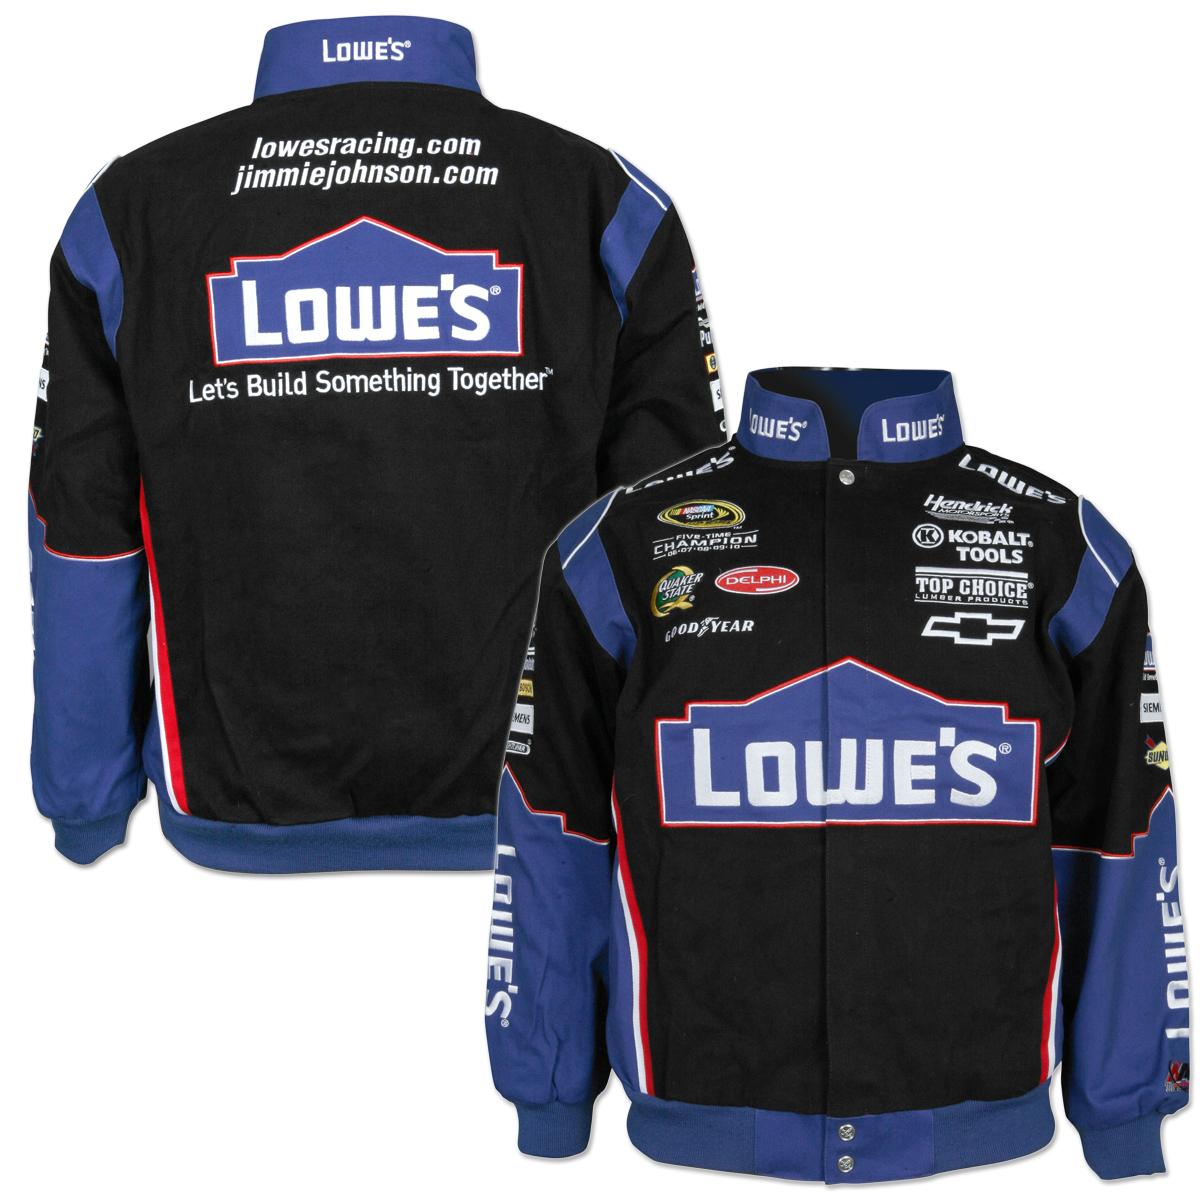 Jimmie johnson leather jacket